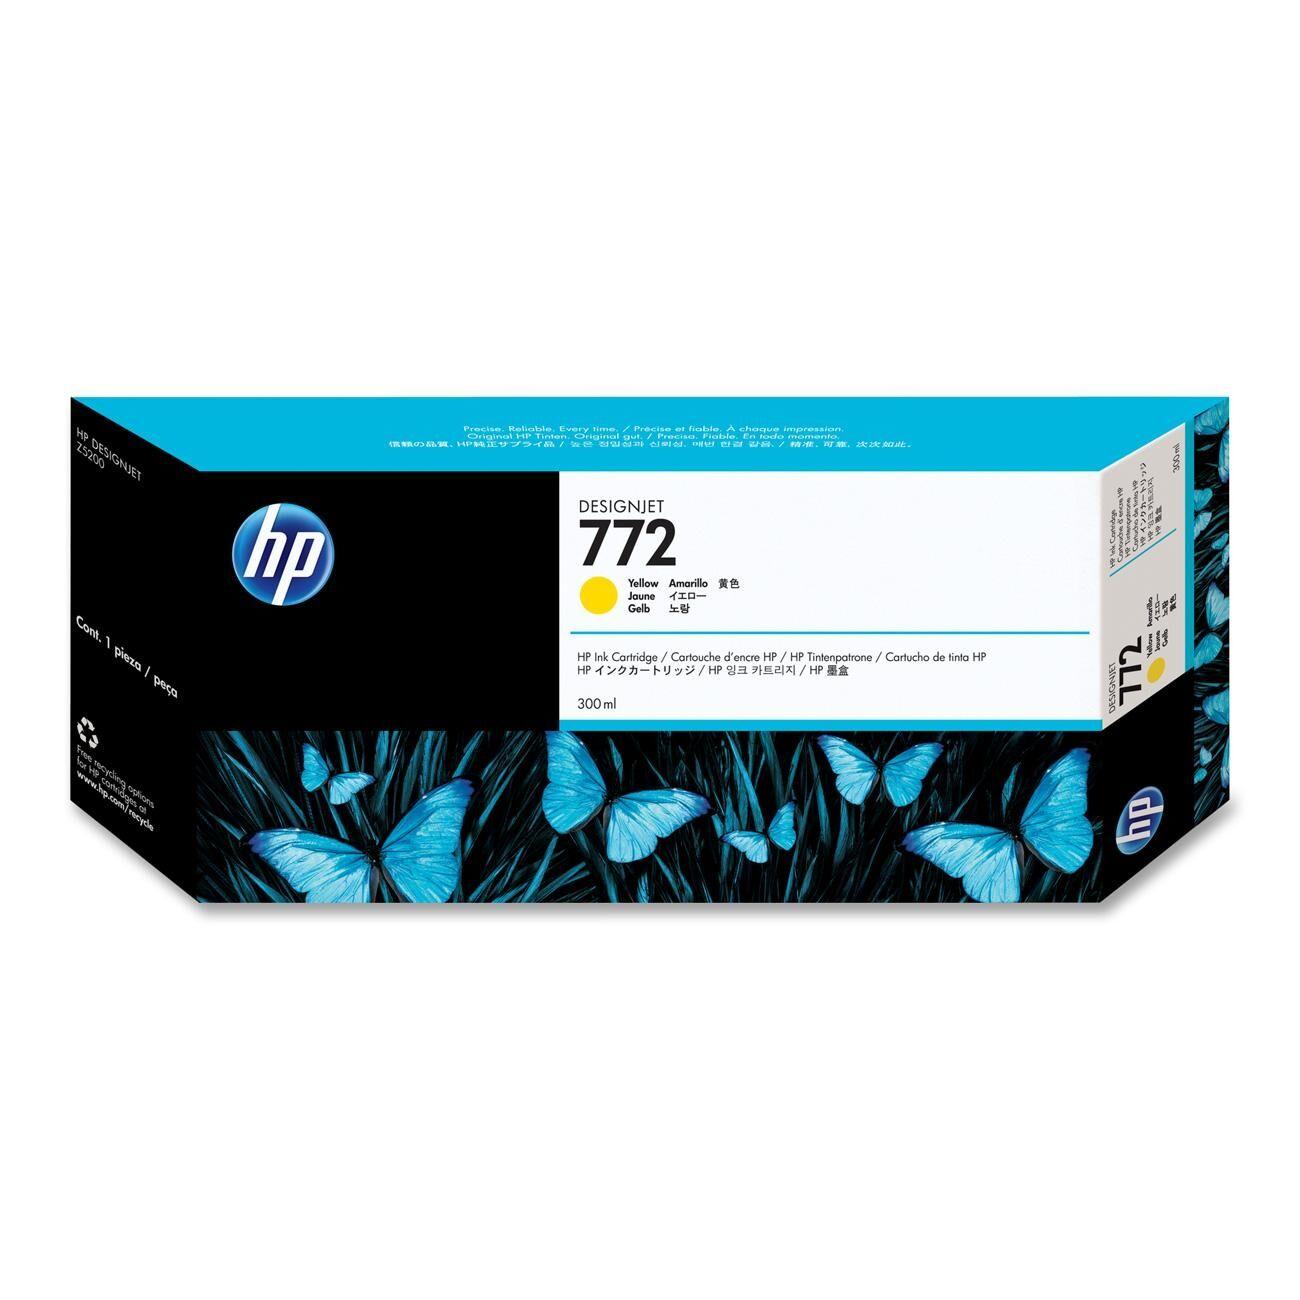 HP Cartouche encre jaune n°772 - 300 ml